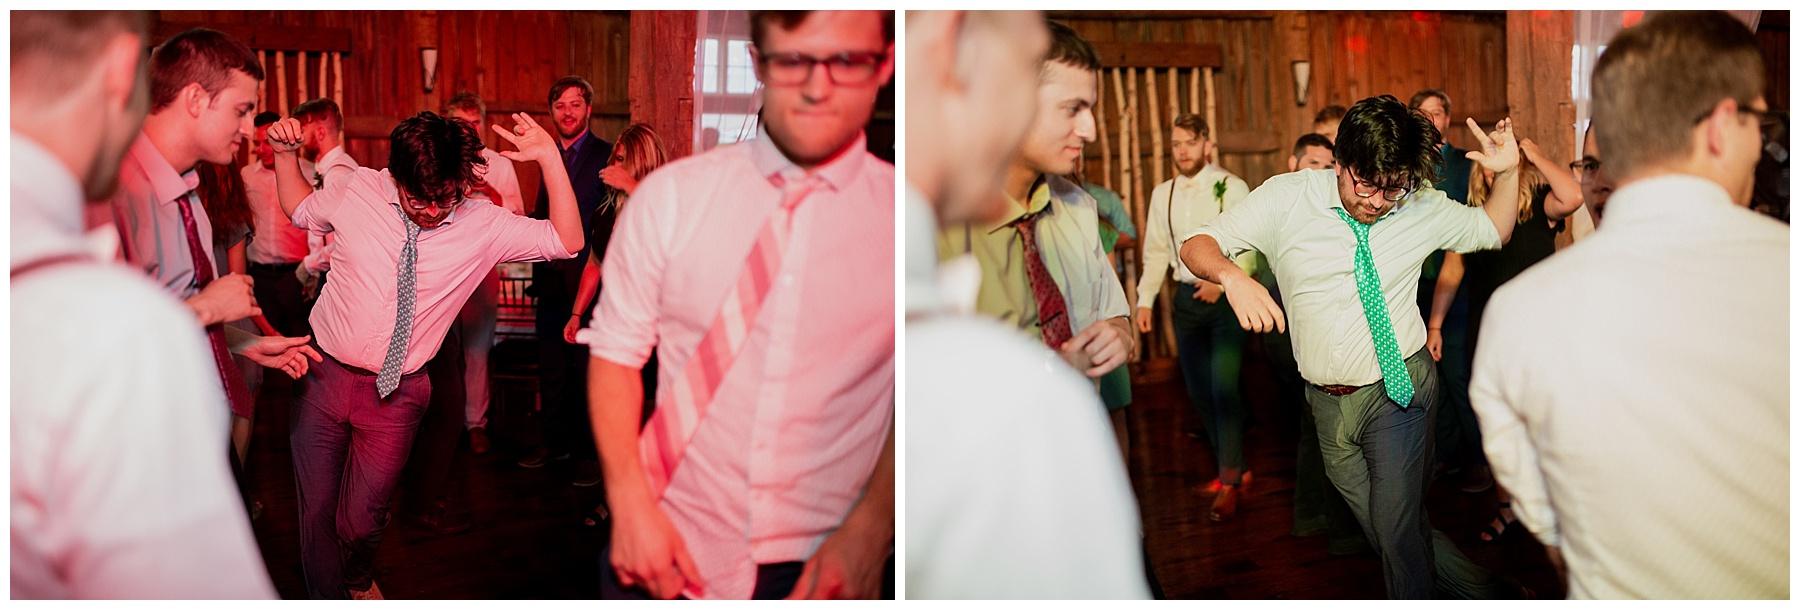 WISCONSIN WEDDING PHOTOGRAPHER 189.jpg